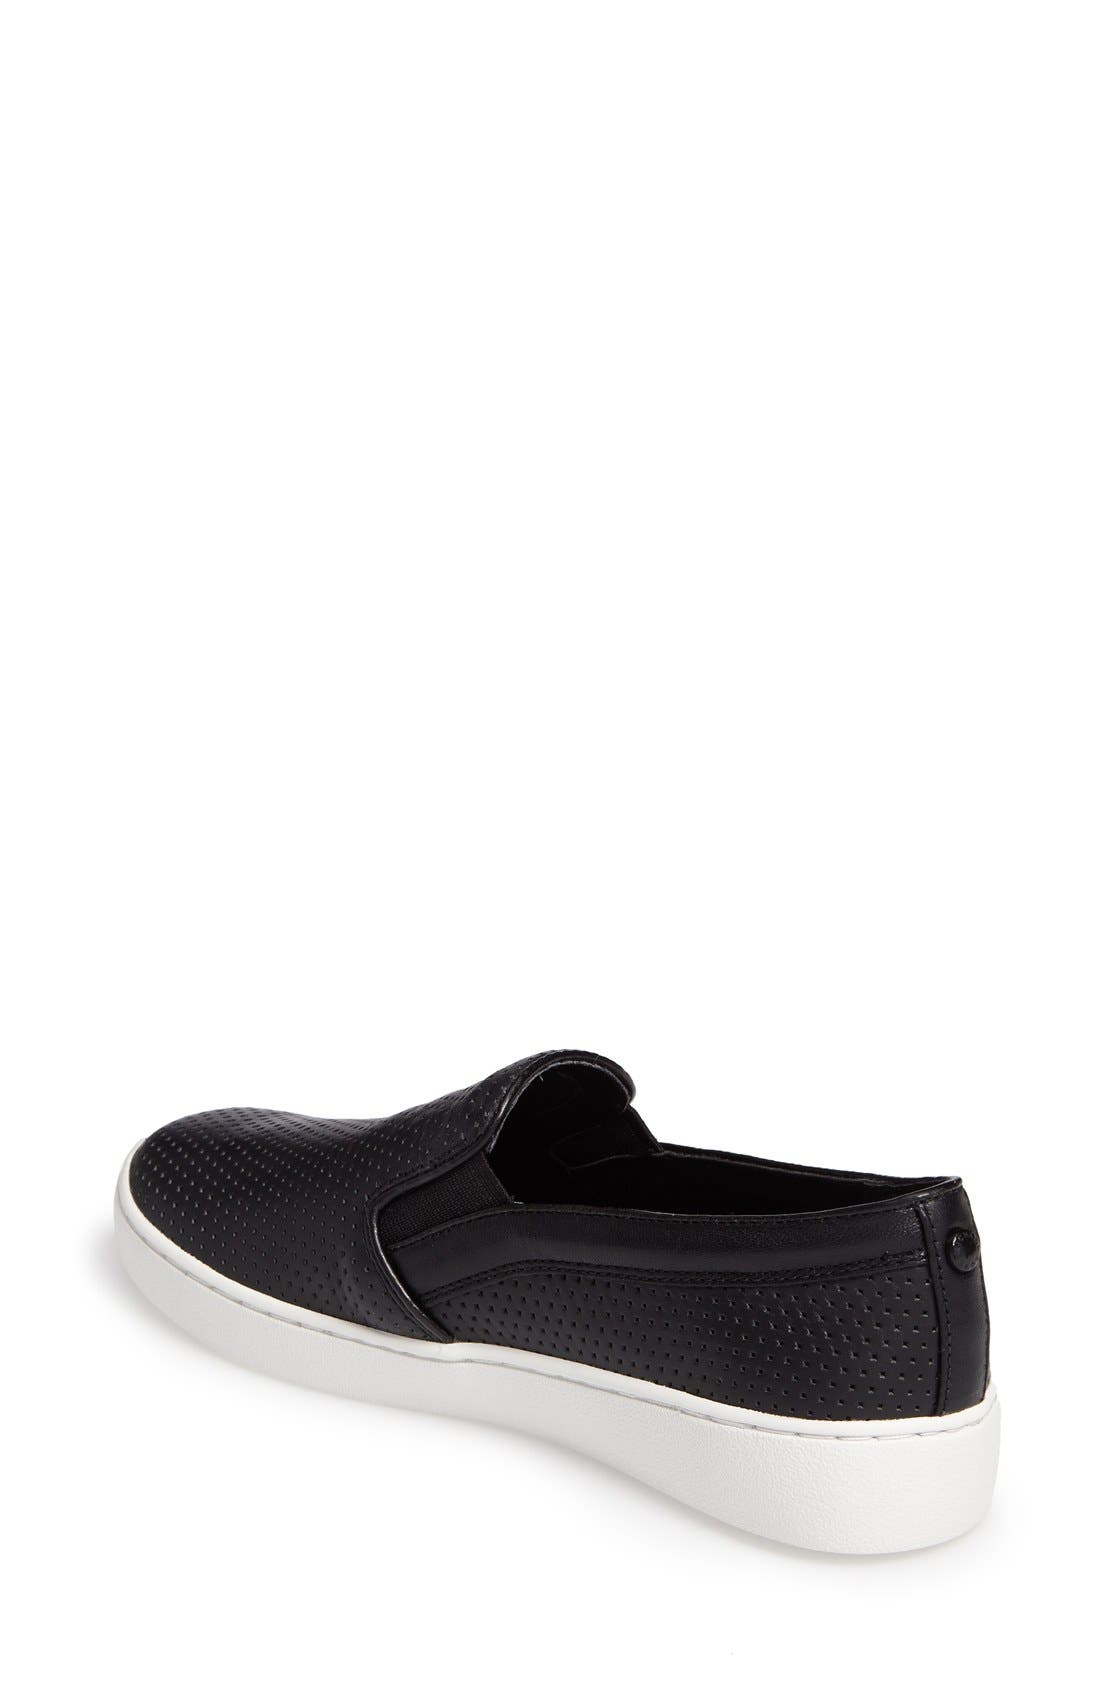 Keaton Slip-On Sneaker,                             Alternate thumbnail 213, color,